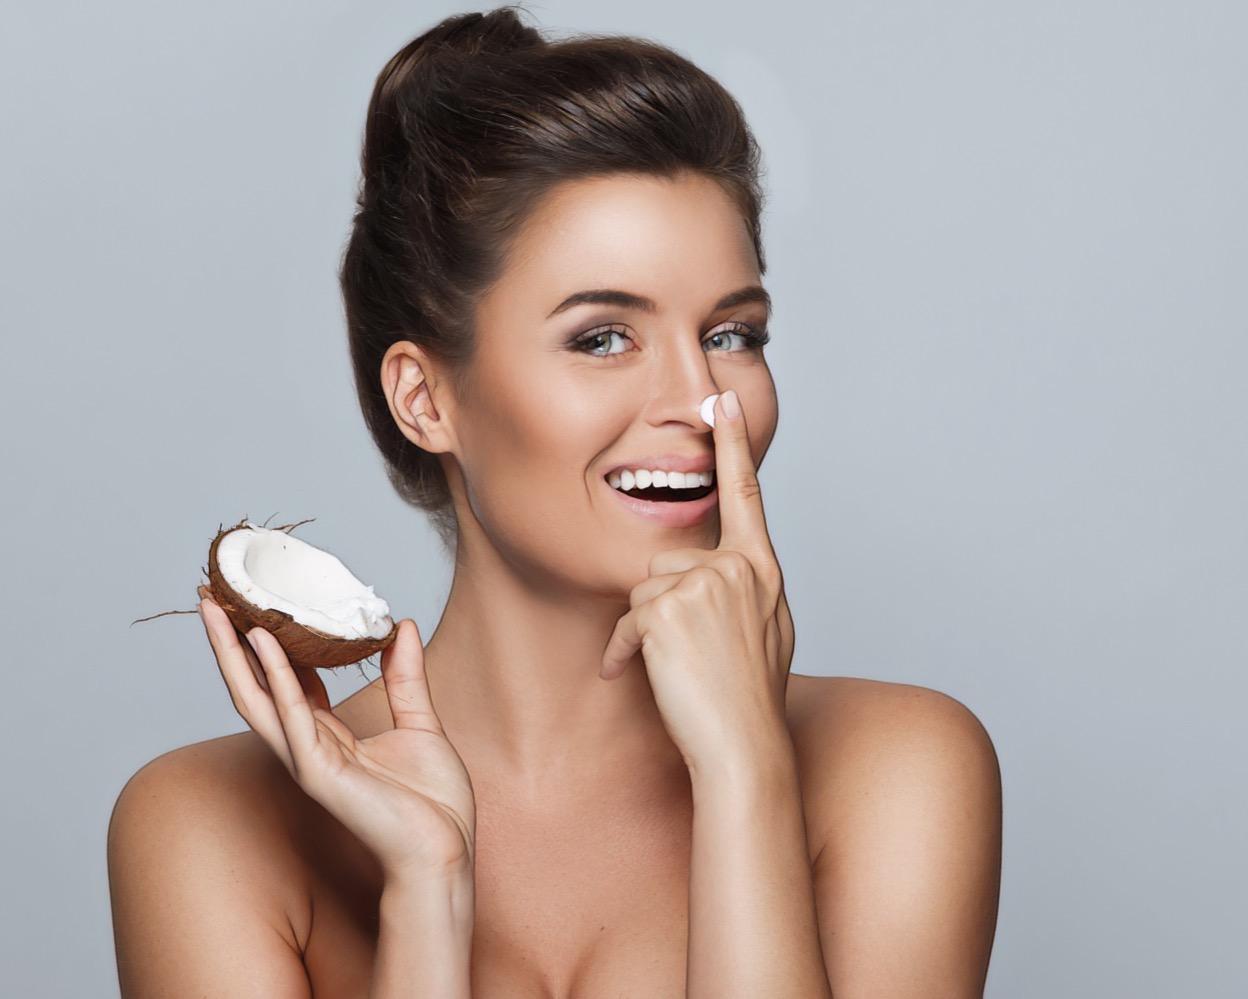 Контурная пластика носа − альтернатива пластической хирургии